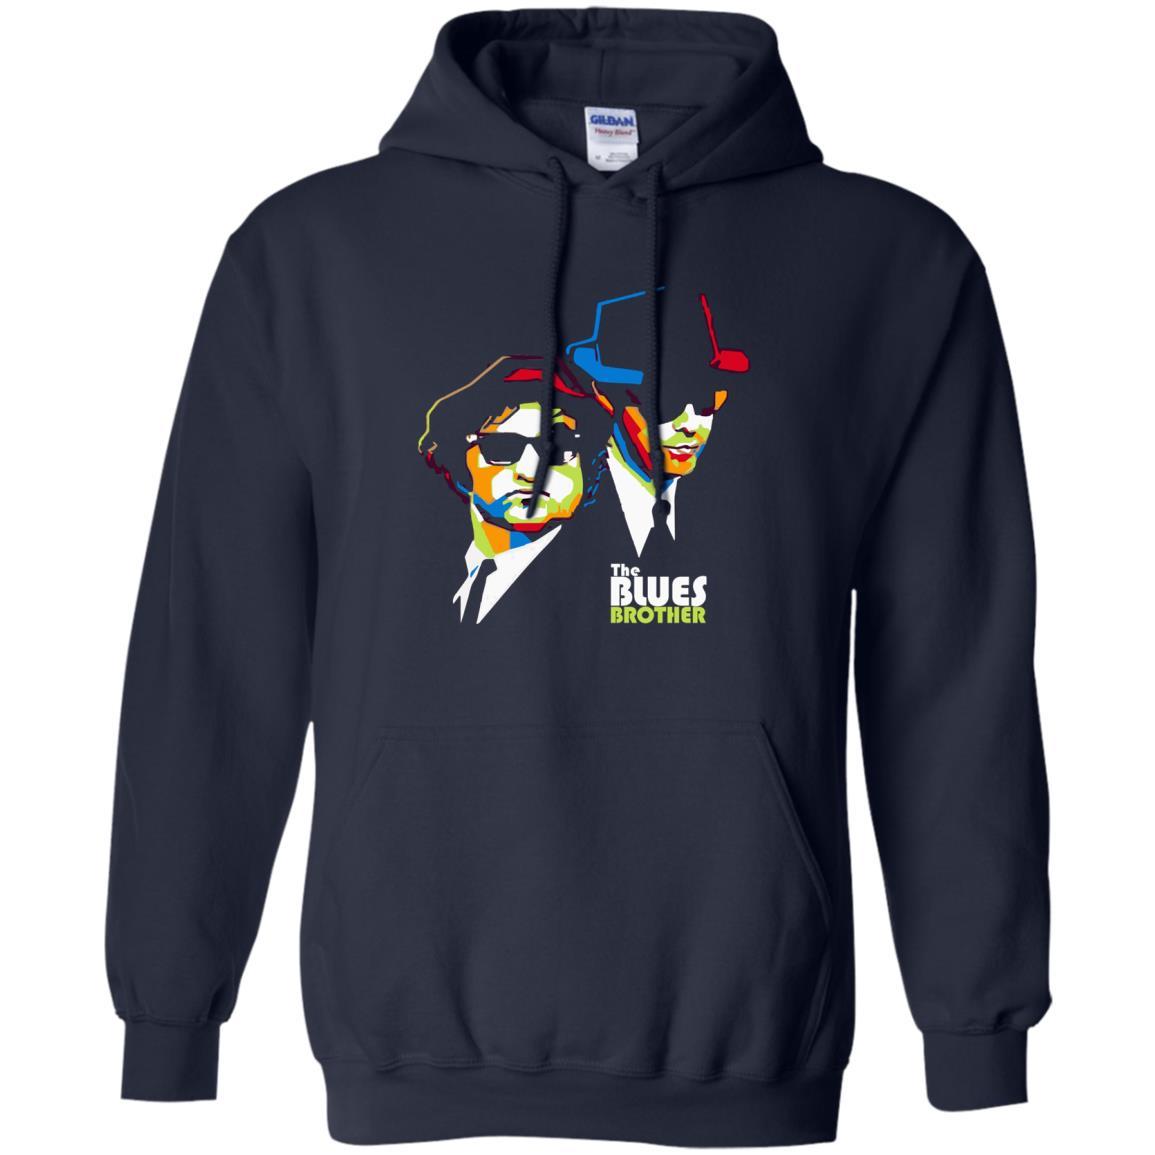 image 644 - The Blues Brother Shirt, Sweatshirt, Hoodie